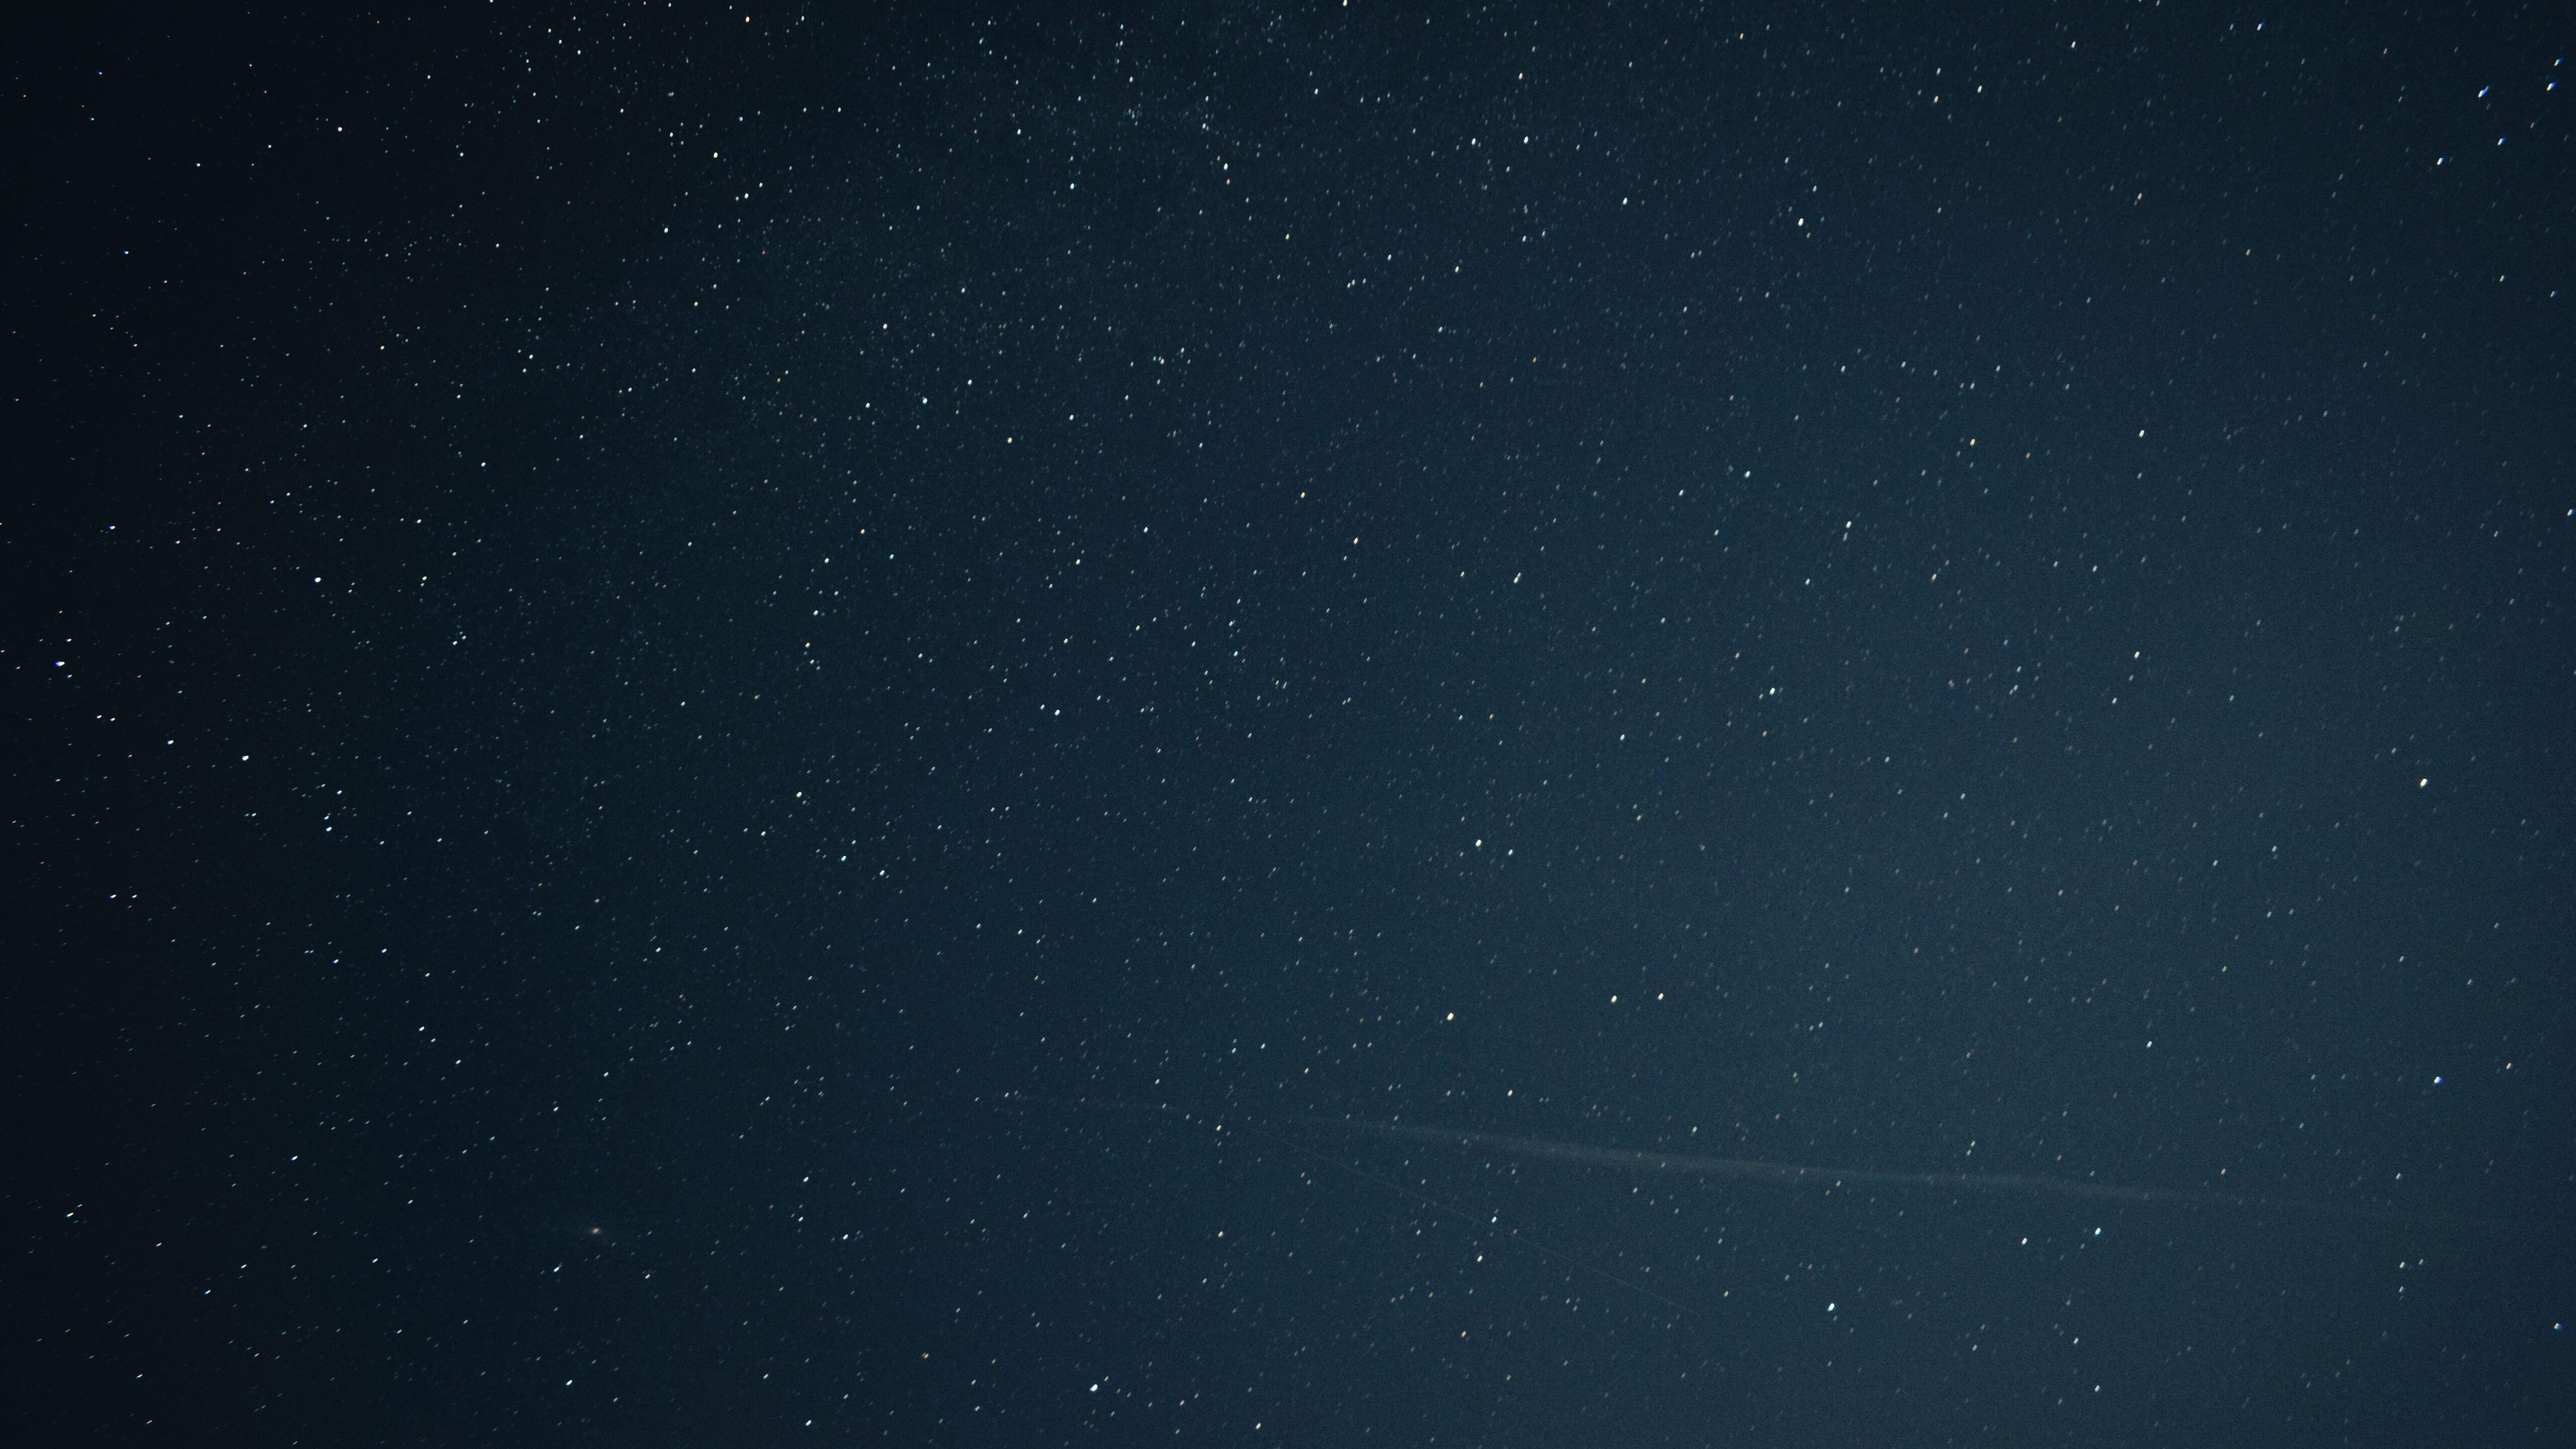 5120x2880 Stars Starry Sky Night 5k 5k Hd 4k Wallpapers